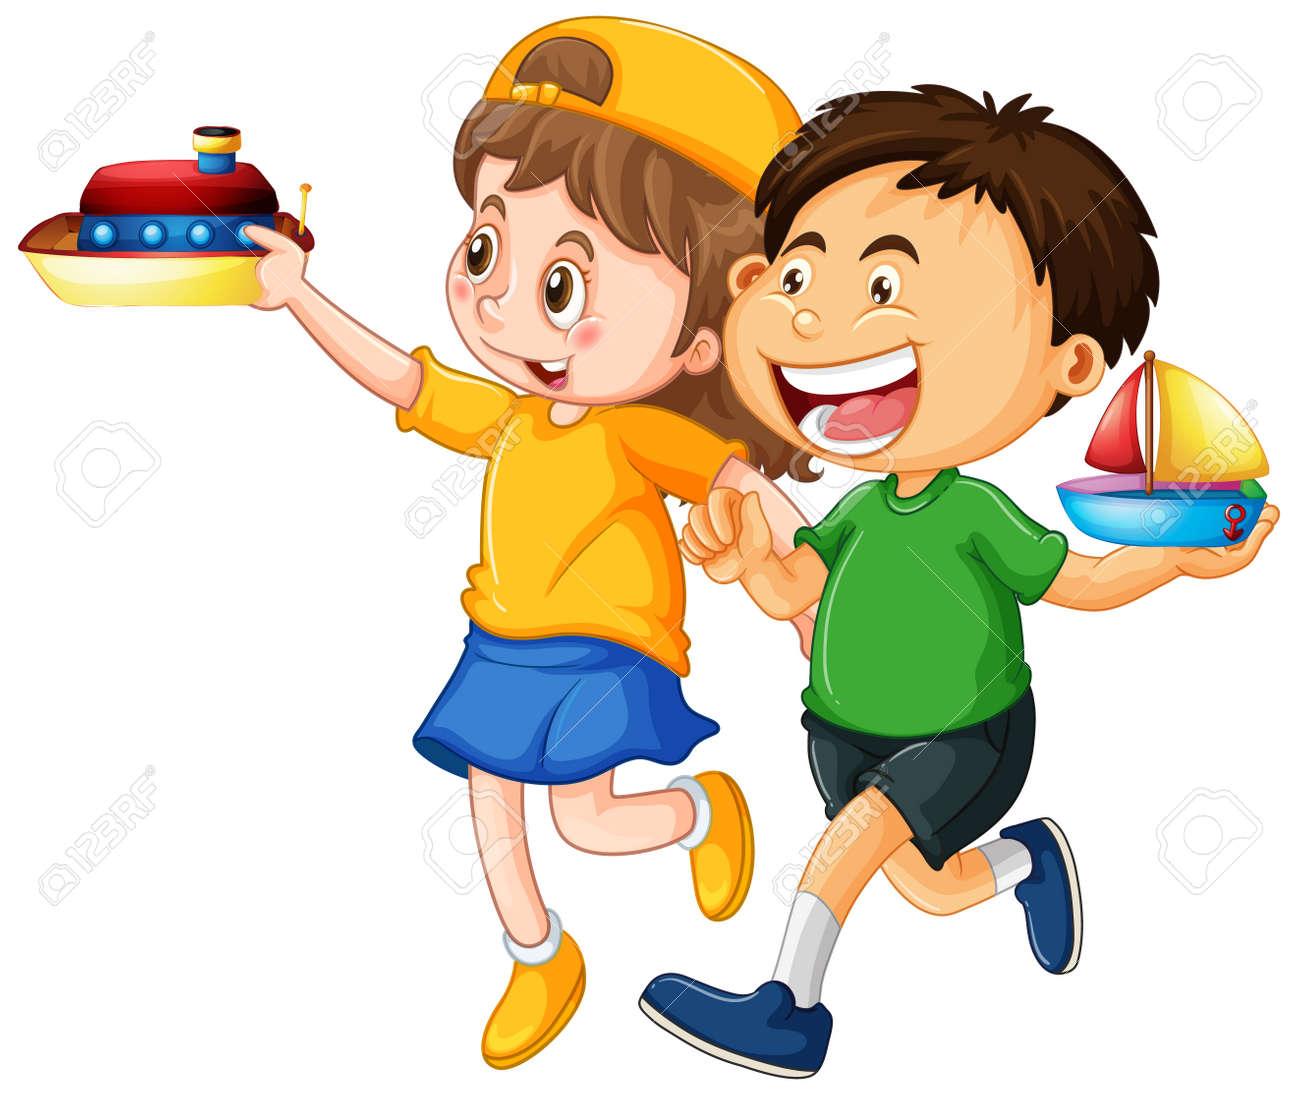 Happy children playing toys illustration - 159381538